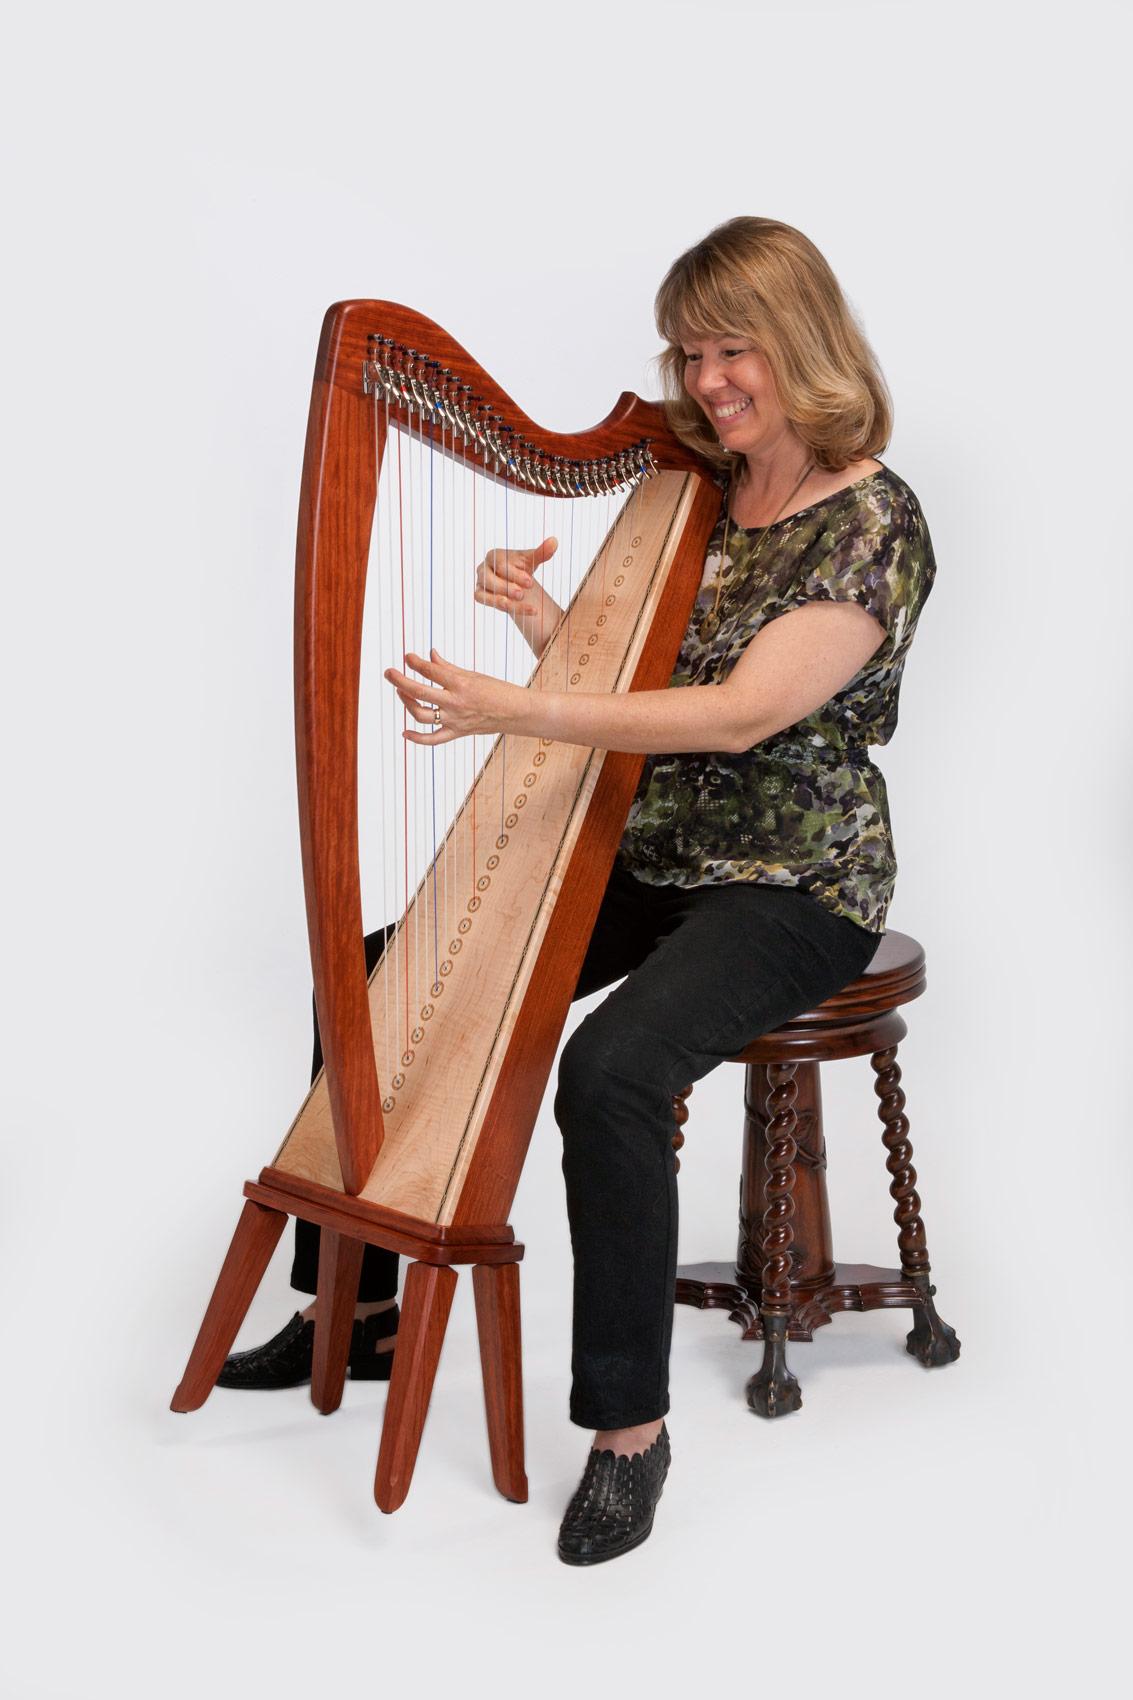 Triplett Shanti 28 String Harp